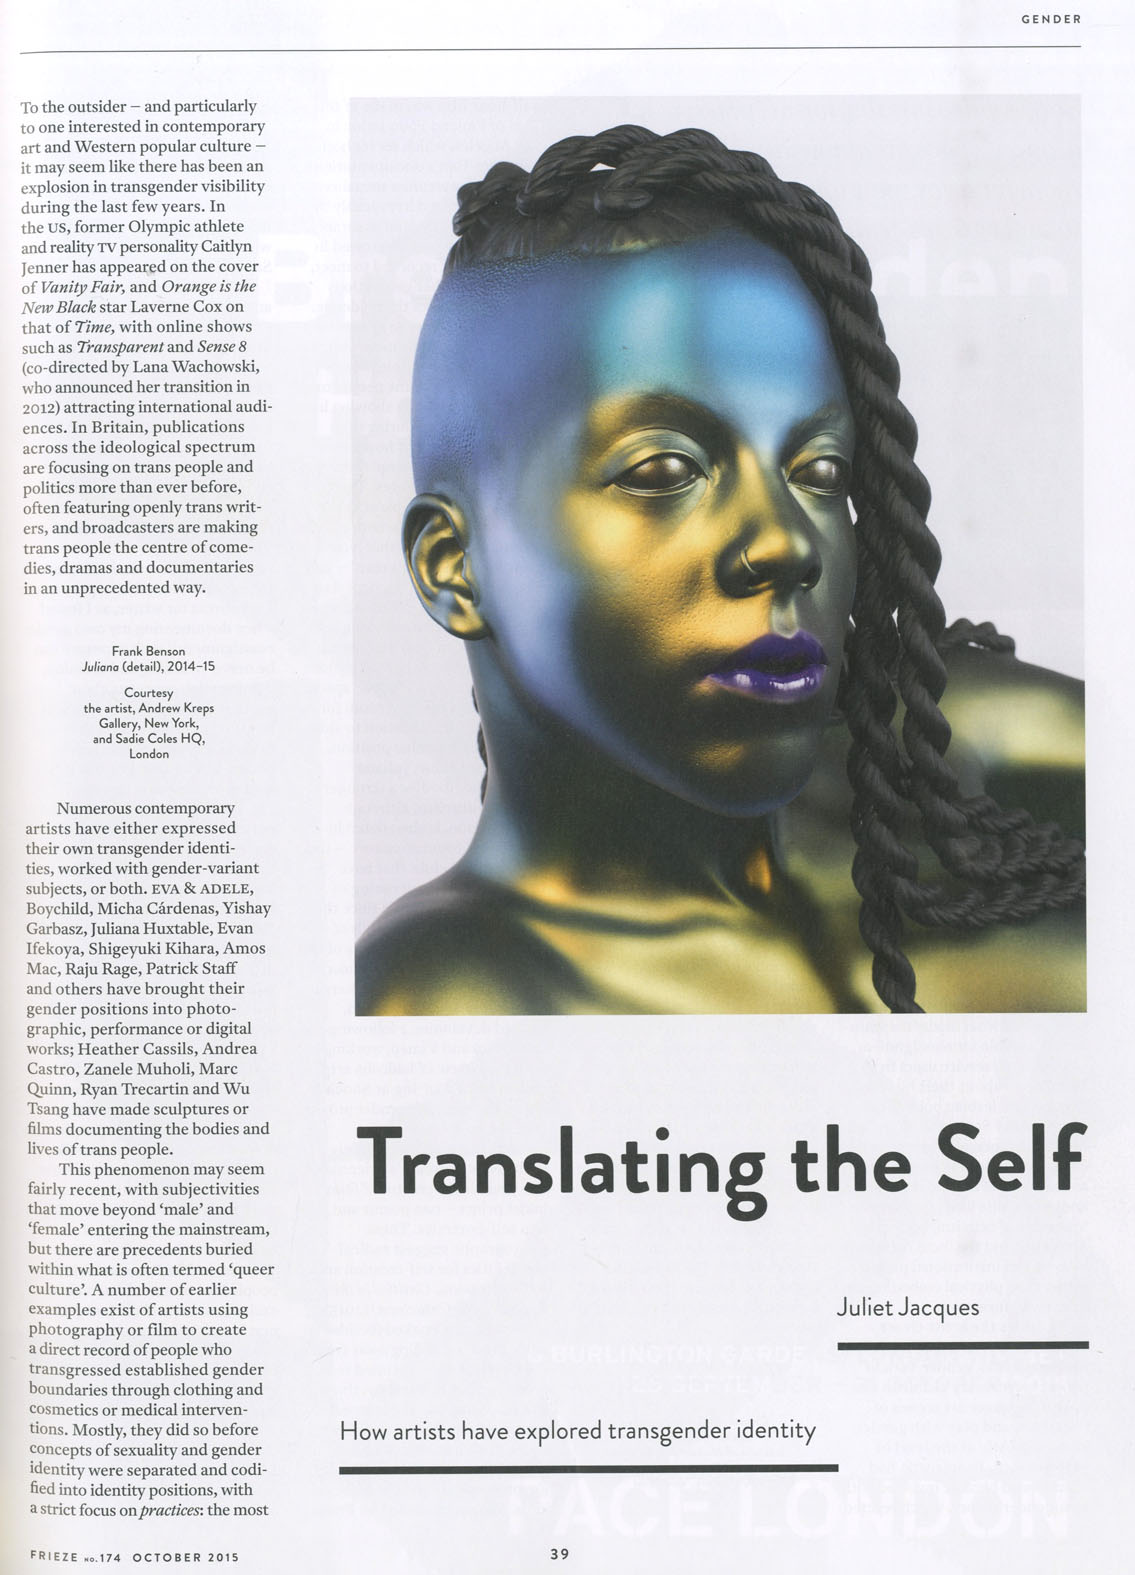 translating the self